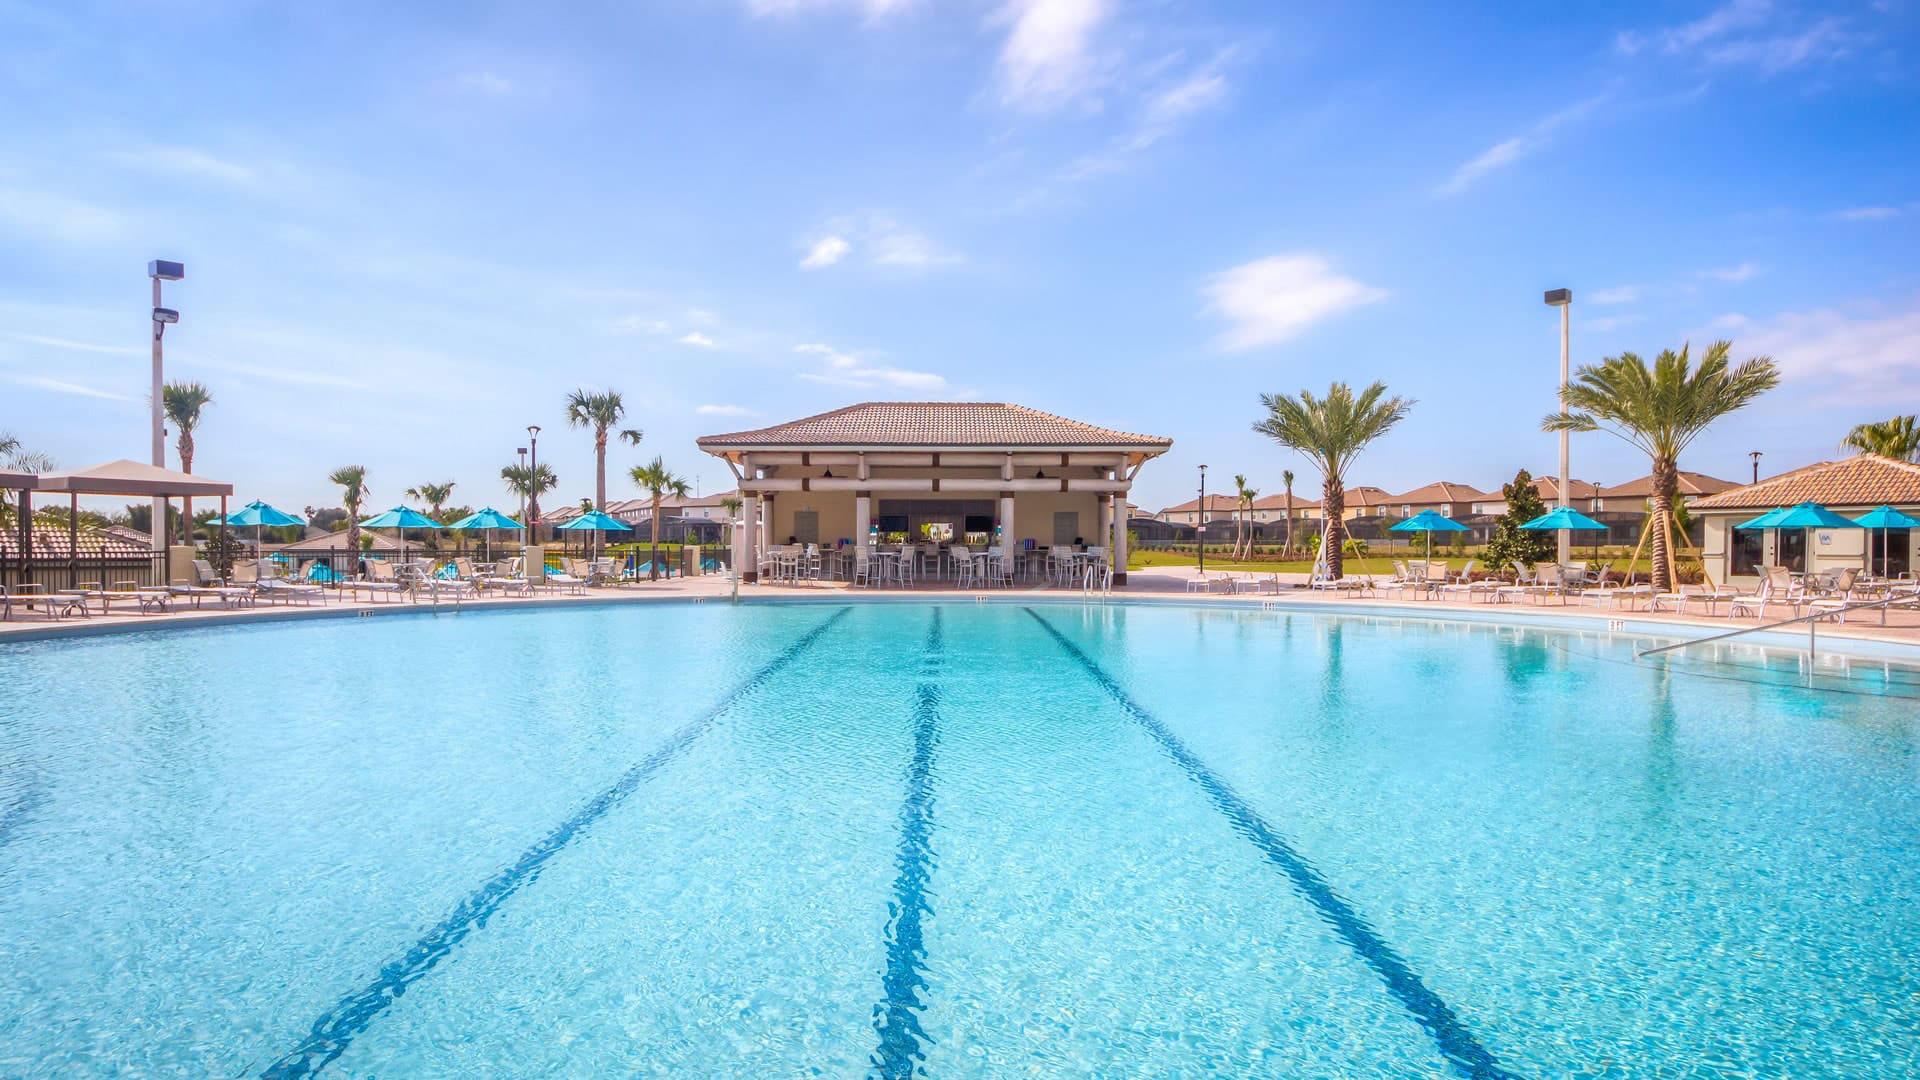 Main adult pool at Champions Gate resort